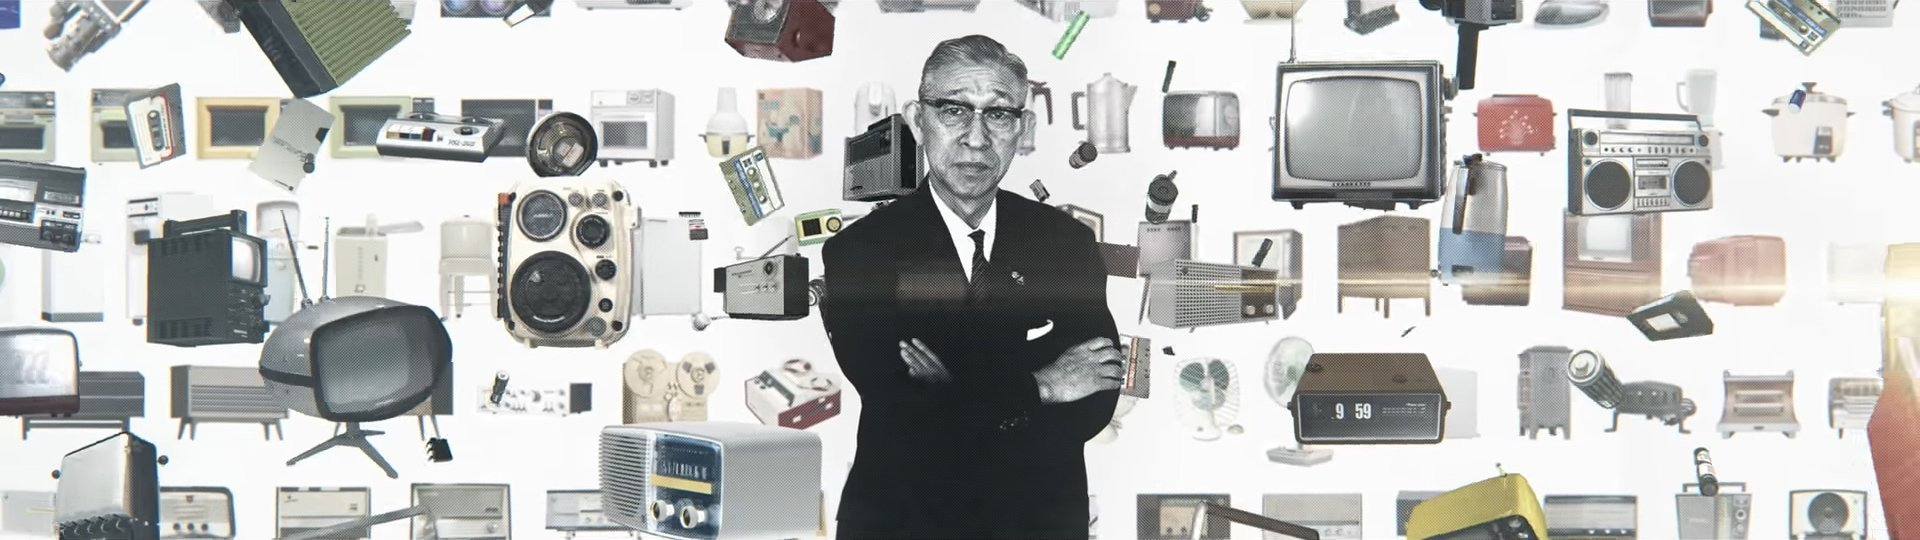 Meet Mr. Matsushita